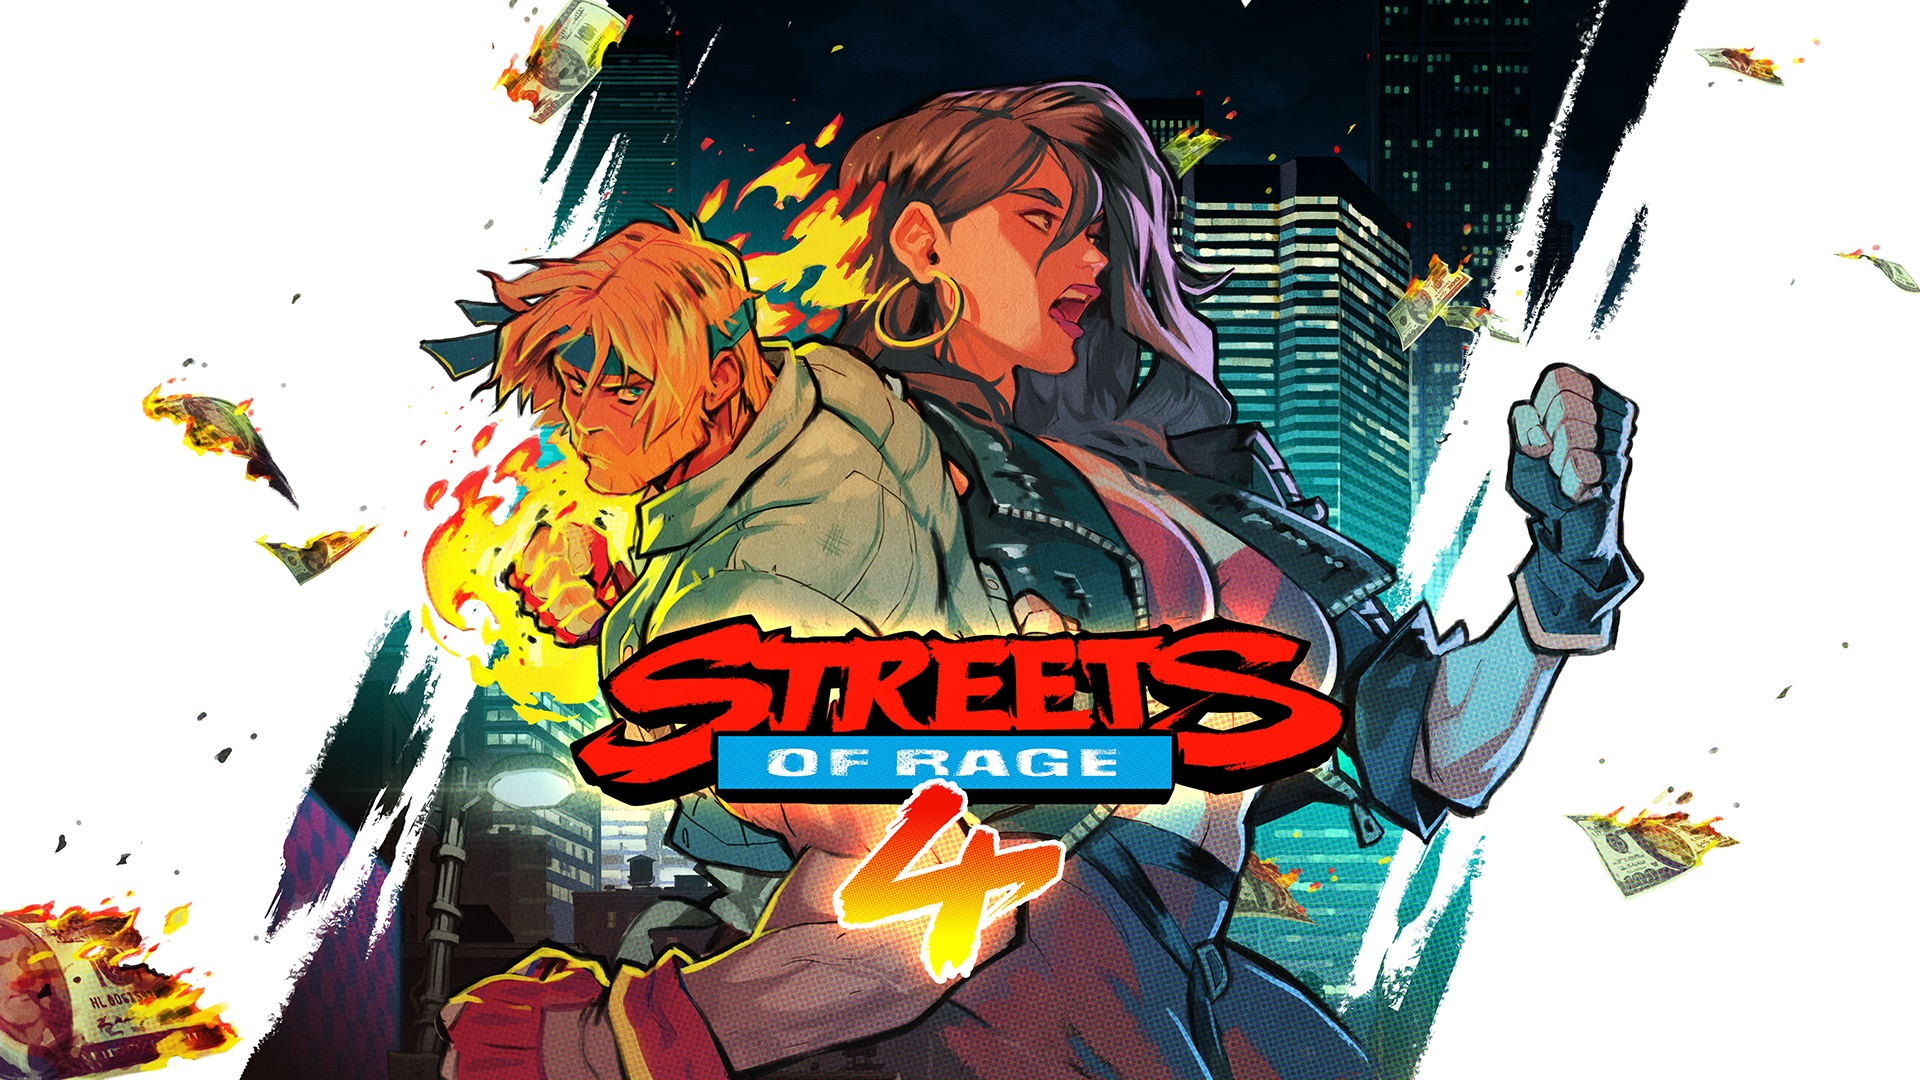 PAX West 2019 | تریلر گیمپلی شخصیت و مرحلهی جدید Streets of Rage 4 منتشر شد